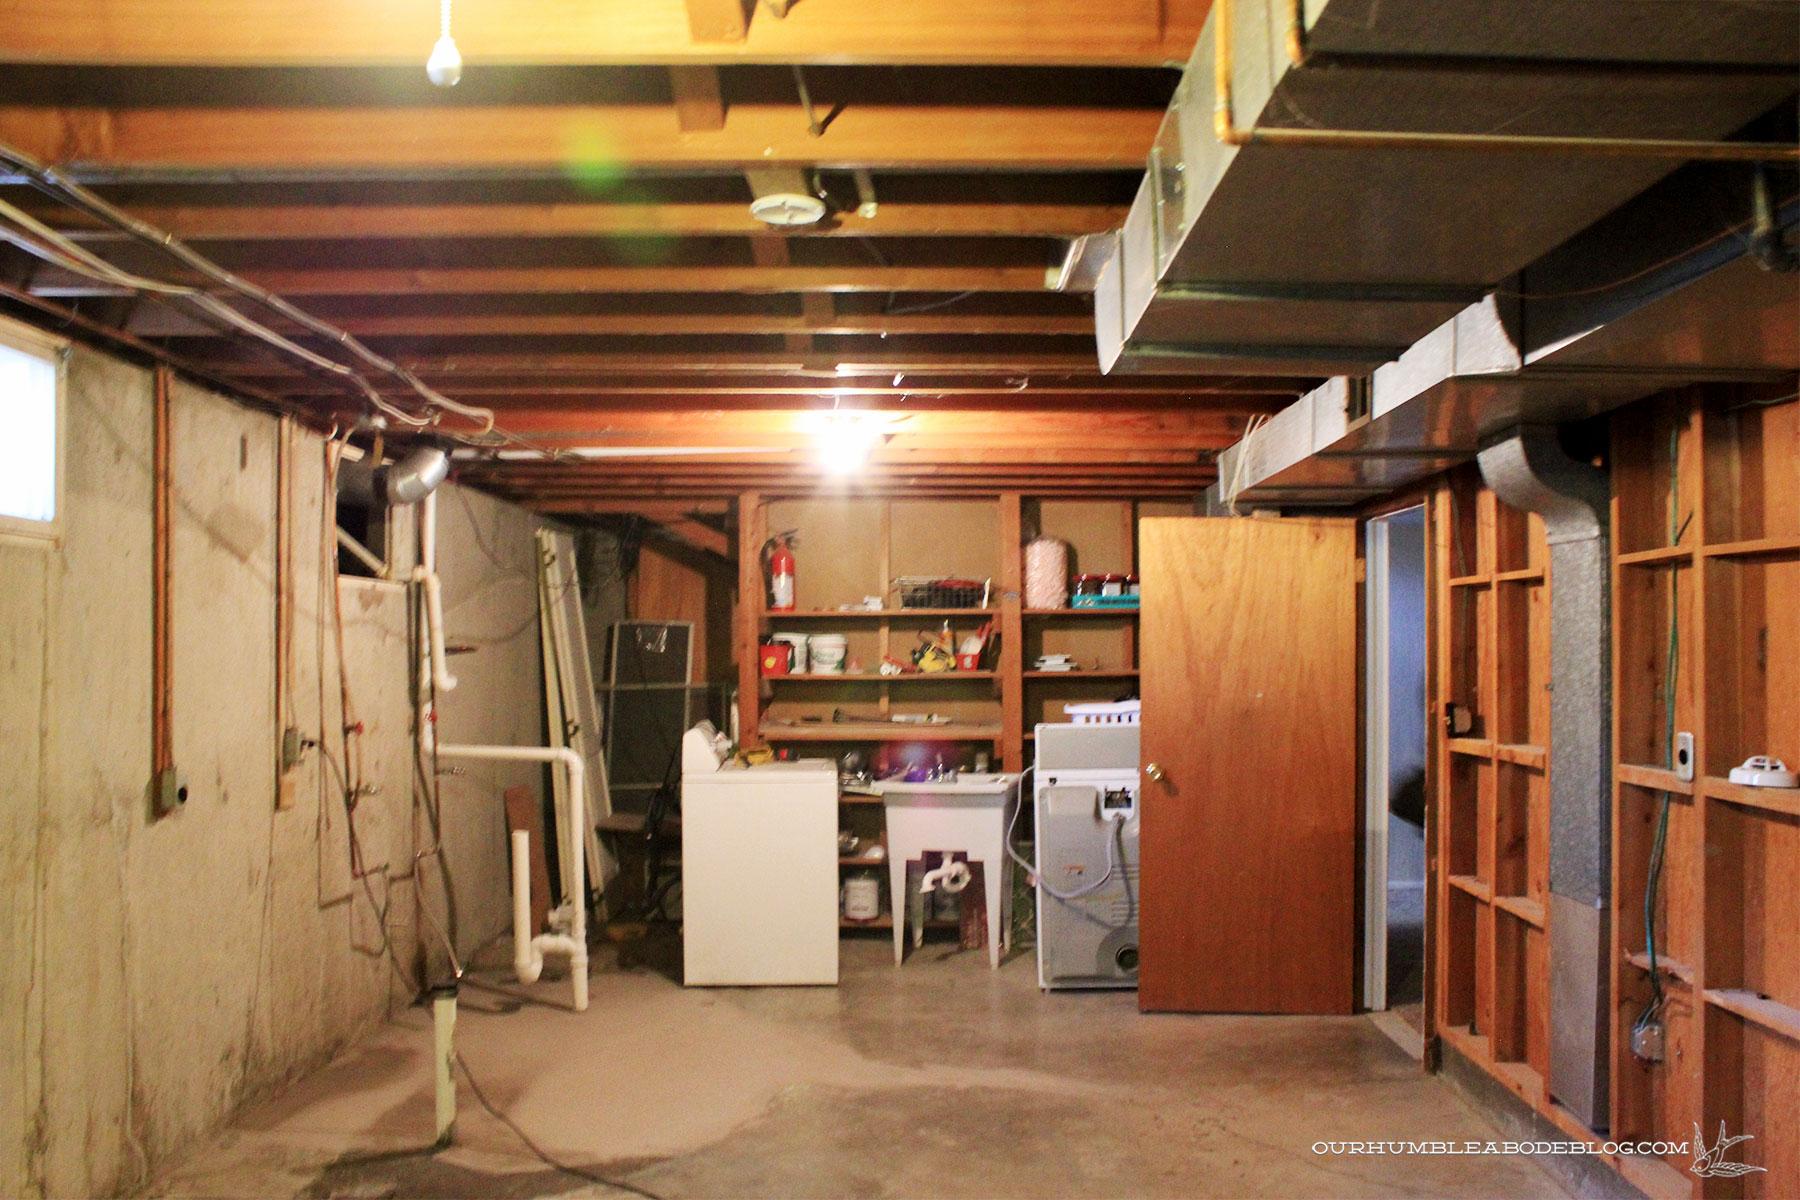 Basement-Before-Toward-Storage-Room